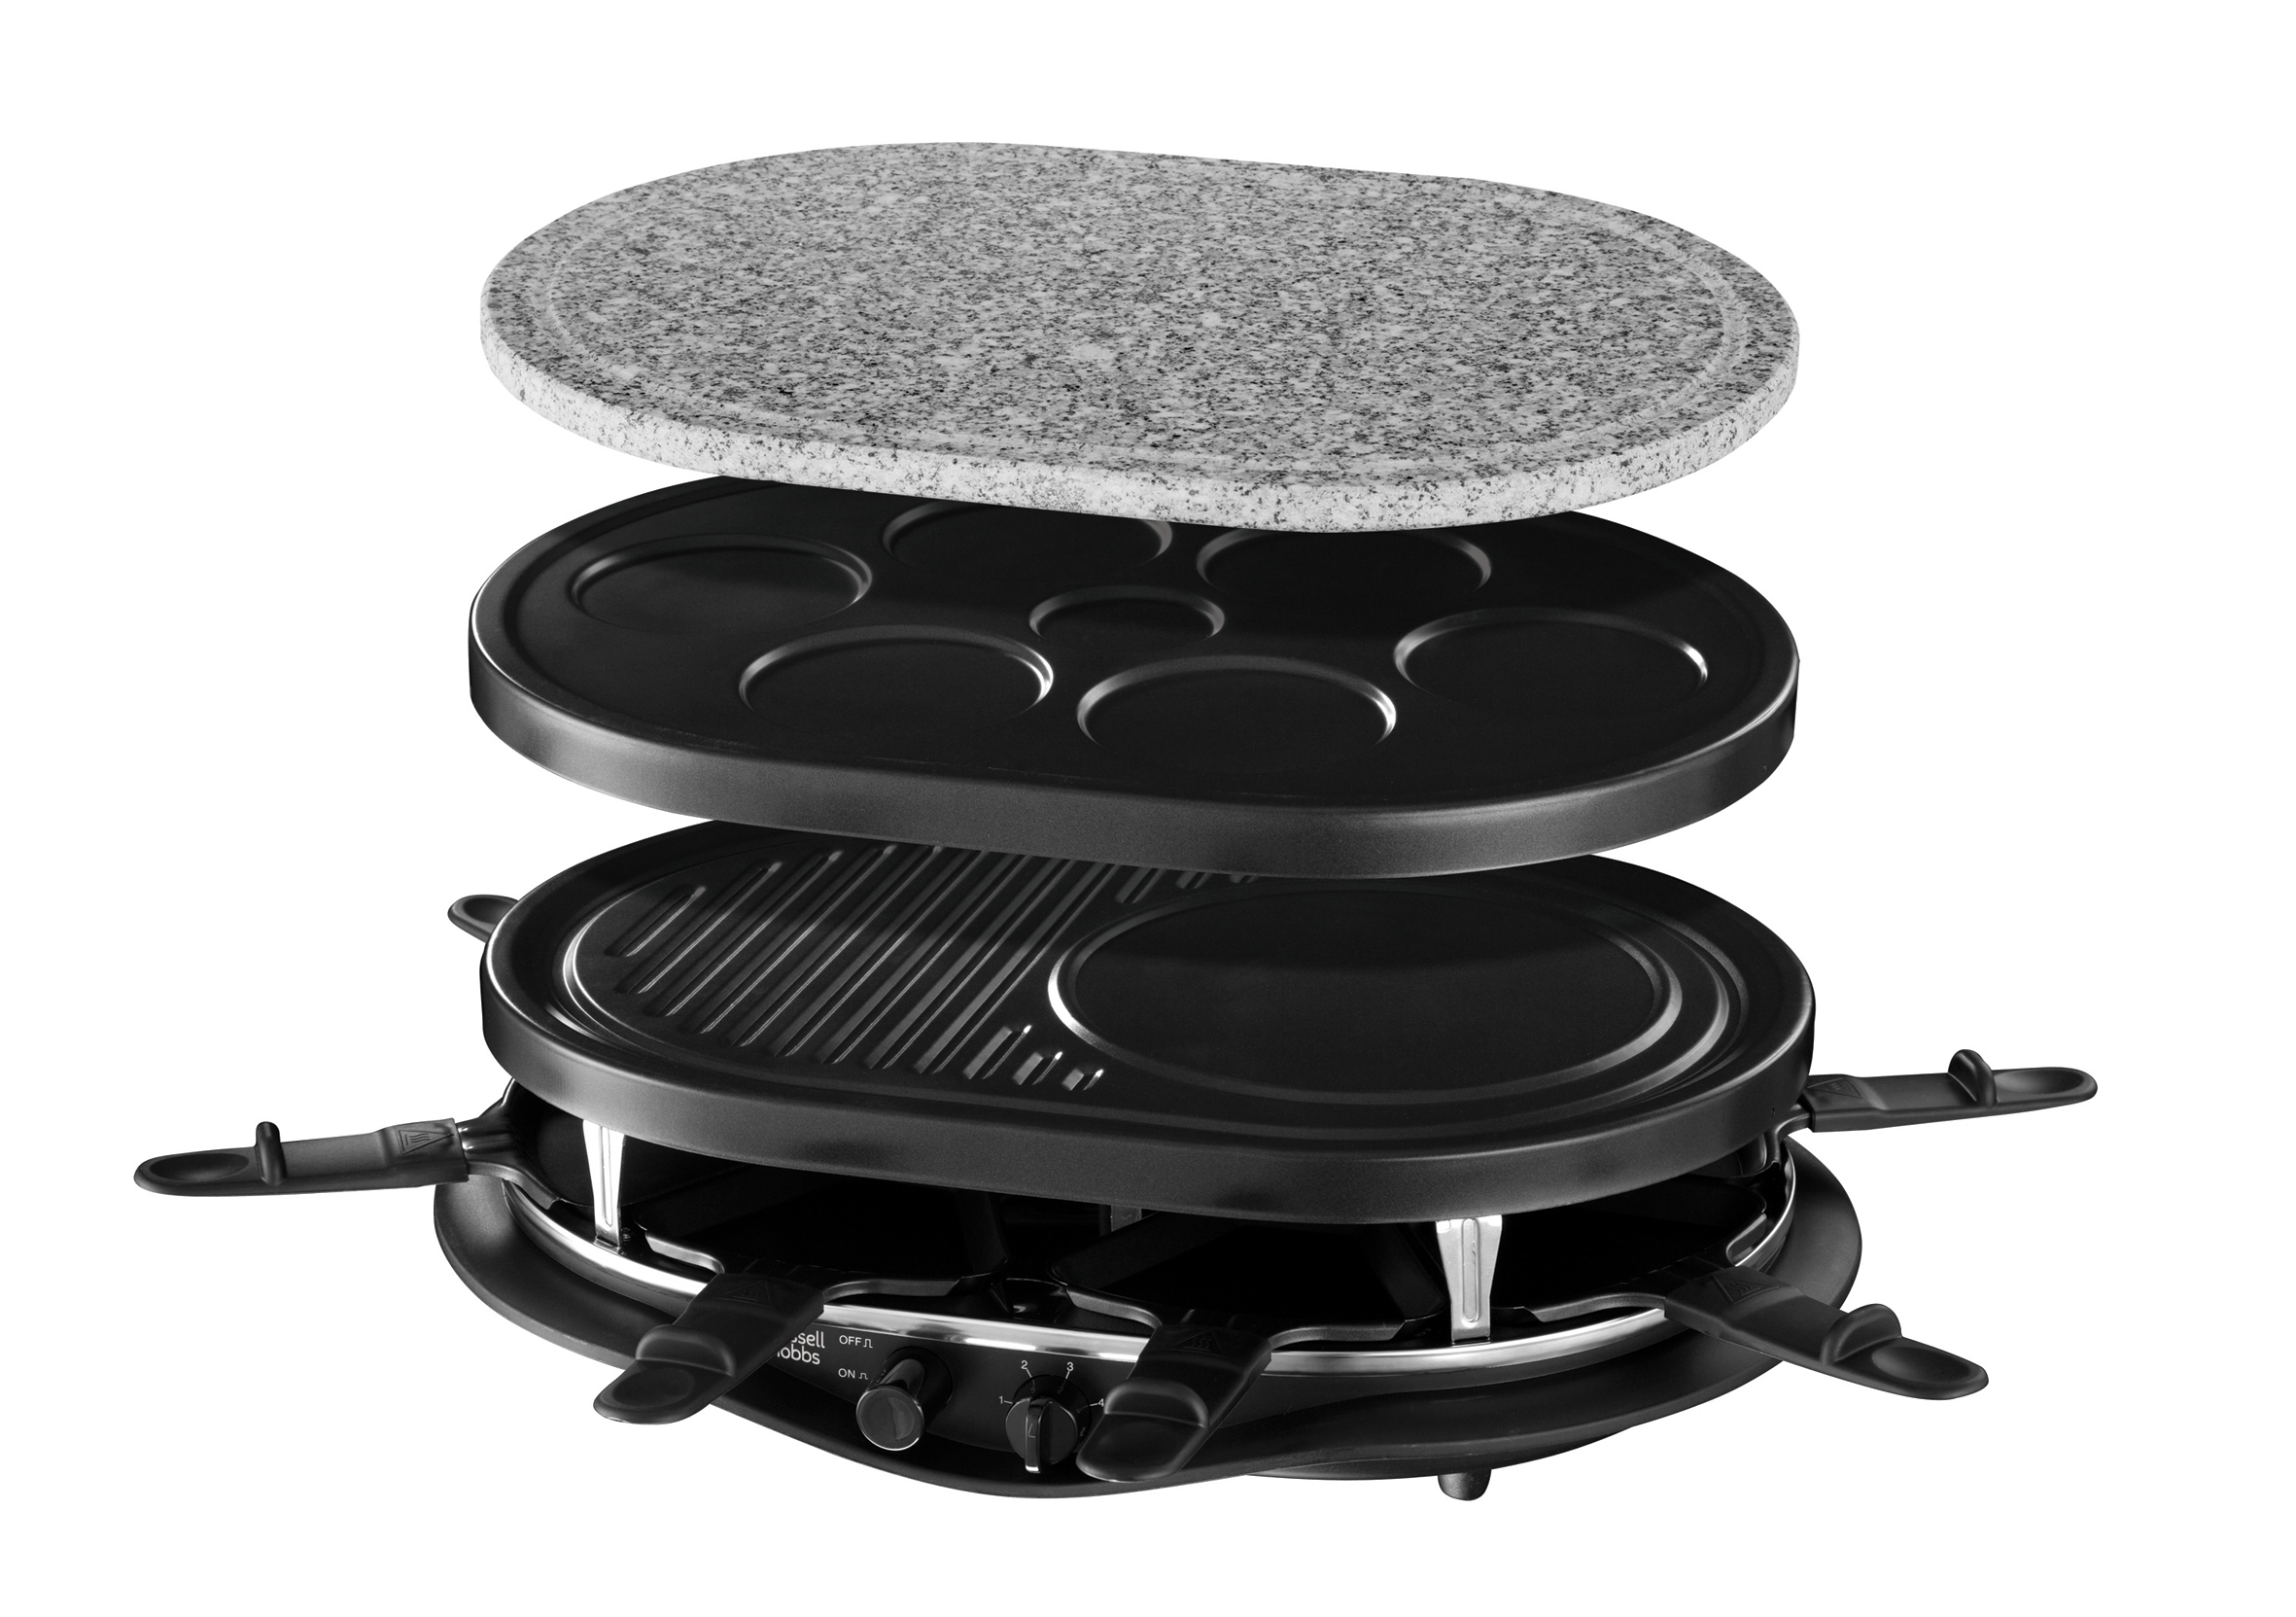 russell hobbs fiesta multi raclette 21000 56 multi. Black Bedroom Furniture Sets. Home Design Ideas